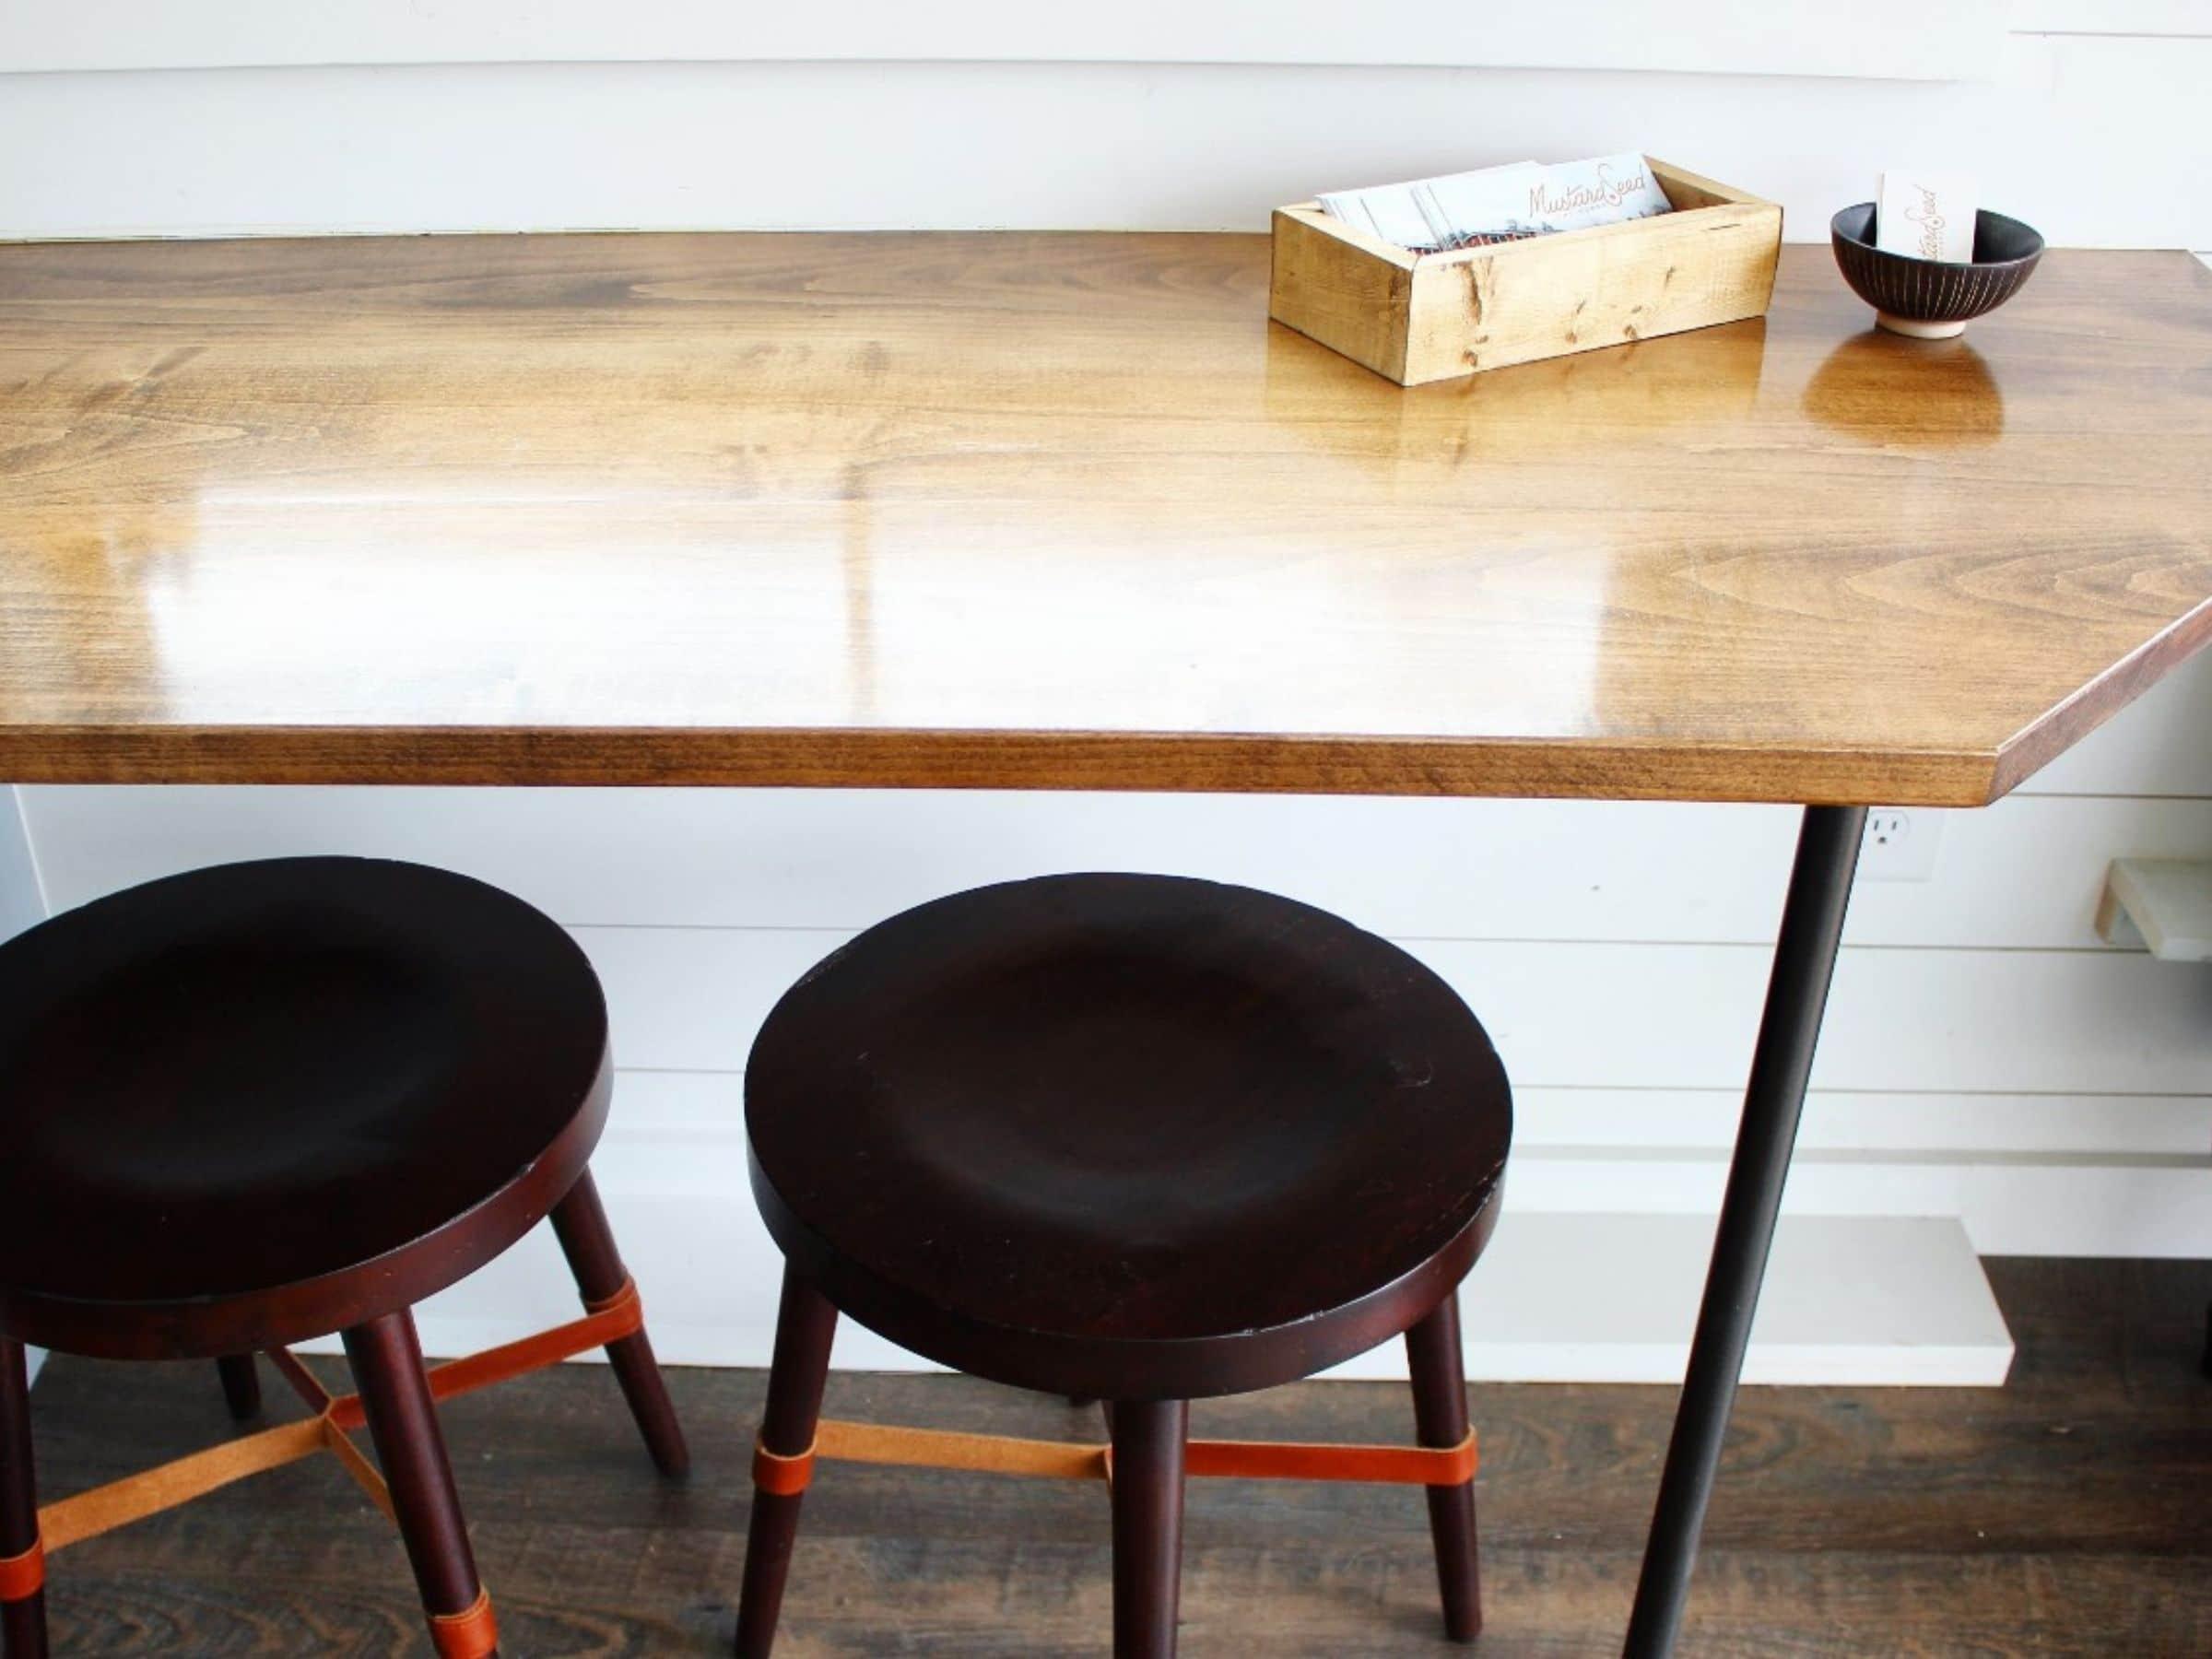 Window table with stools beneath